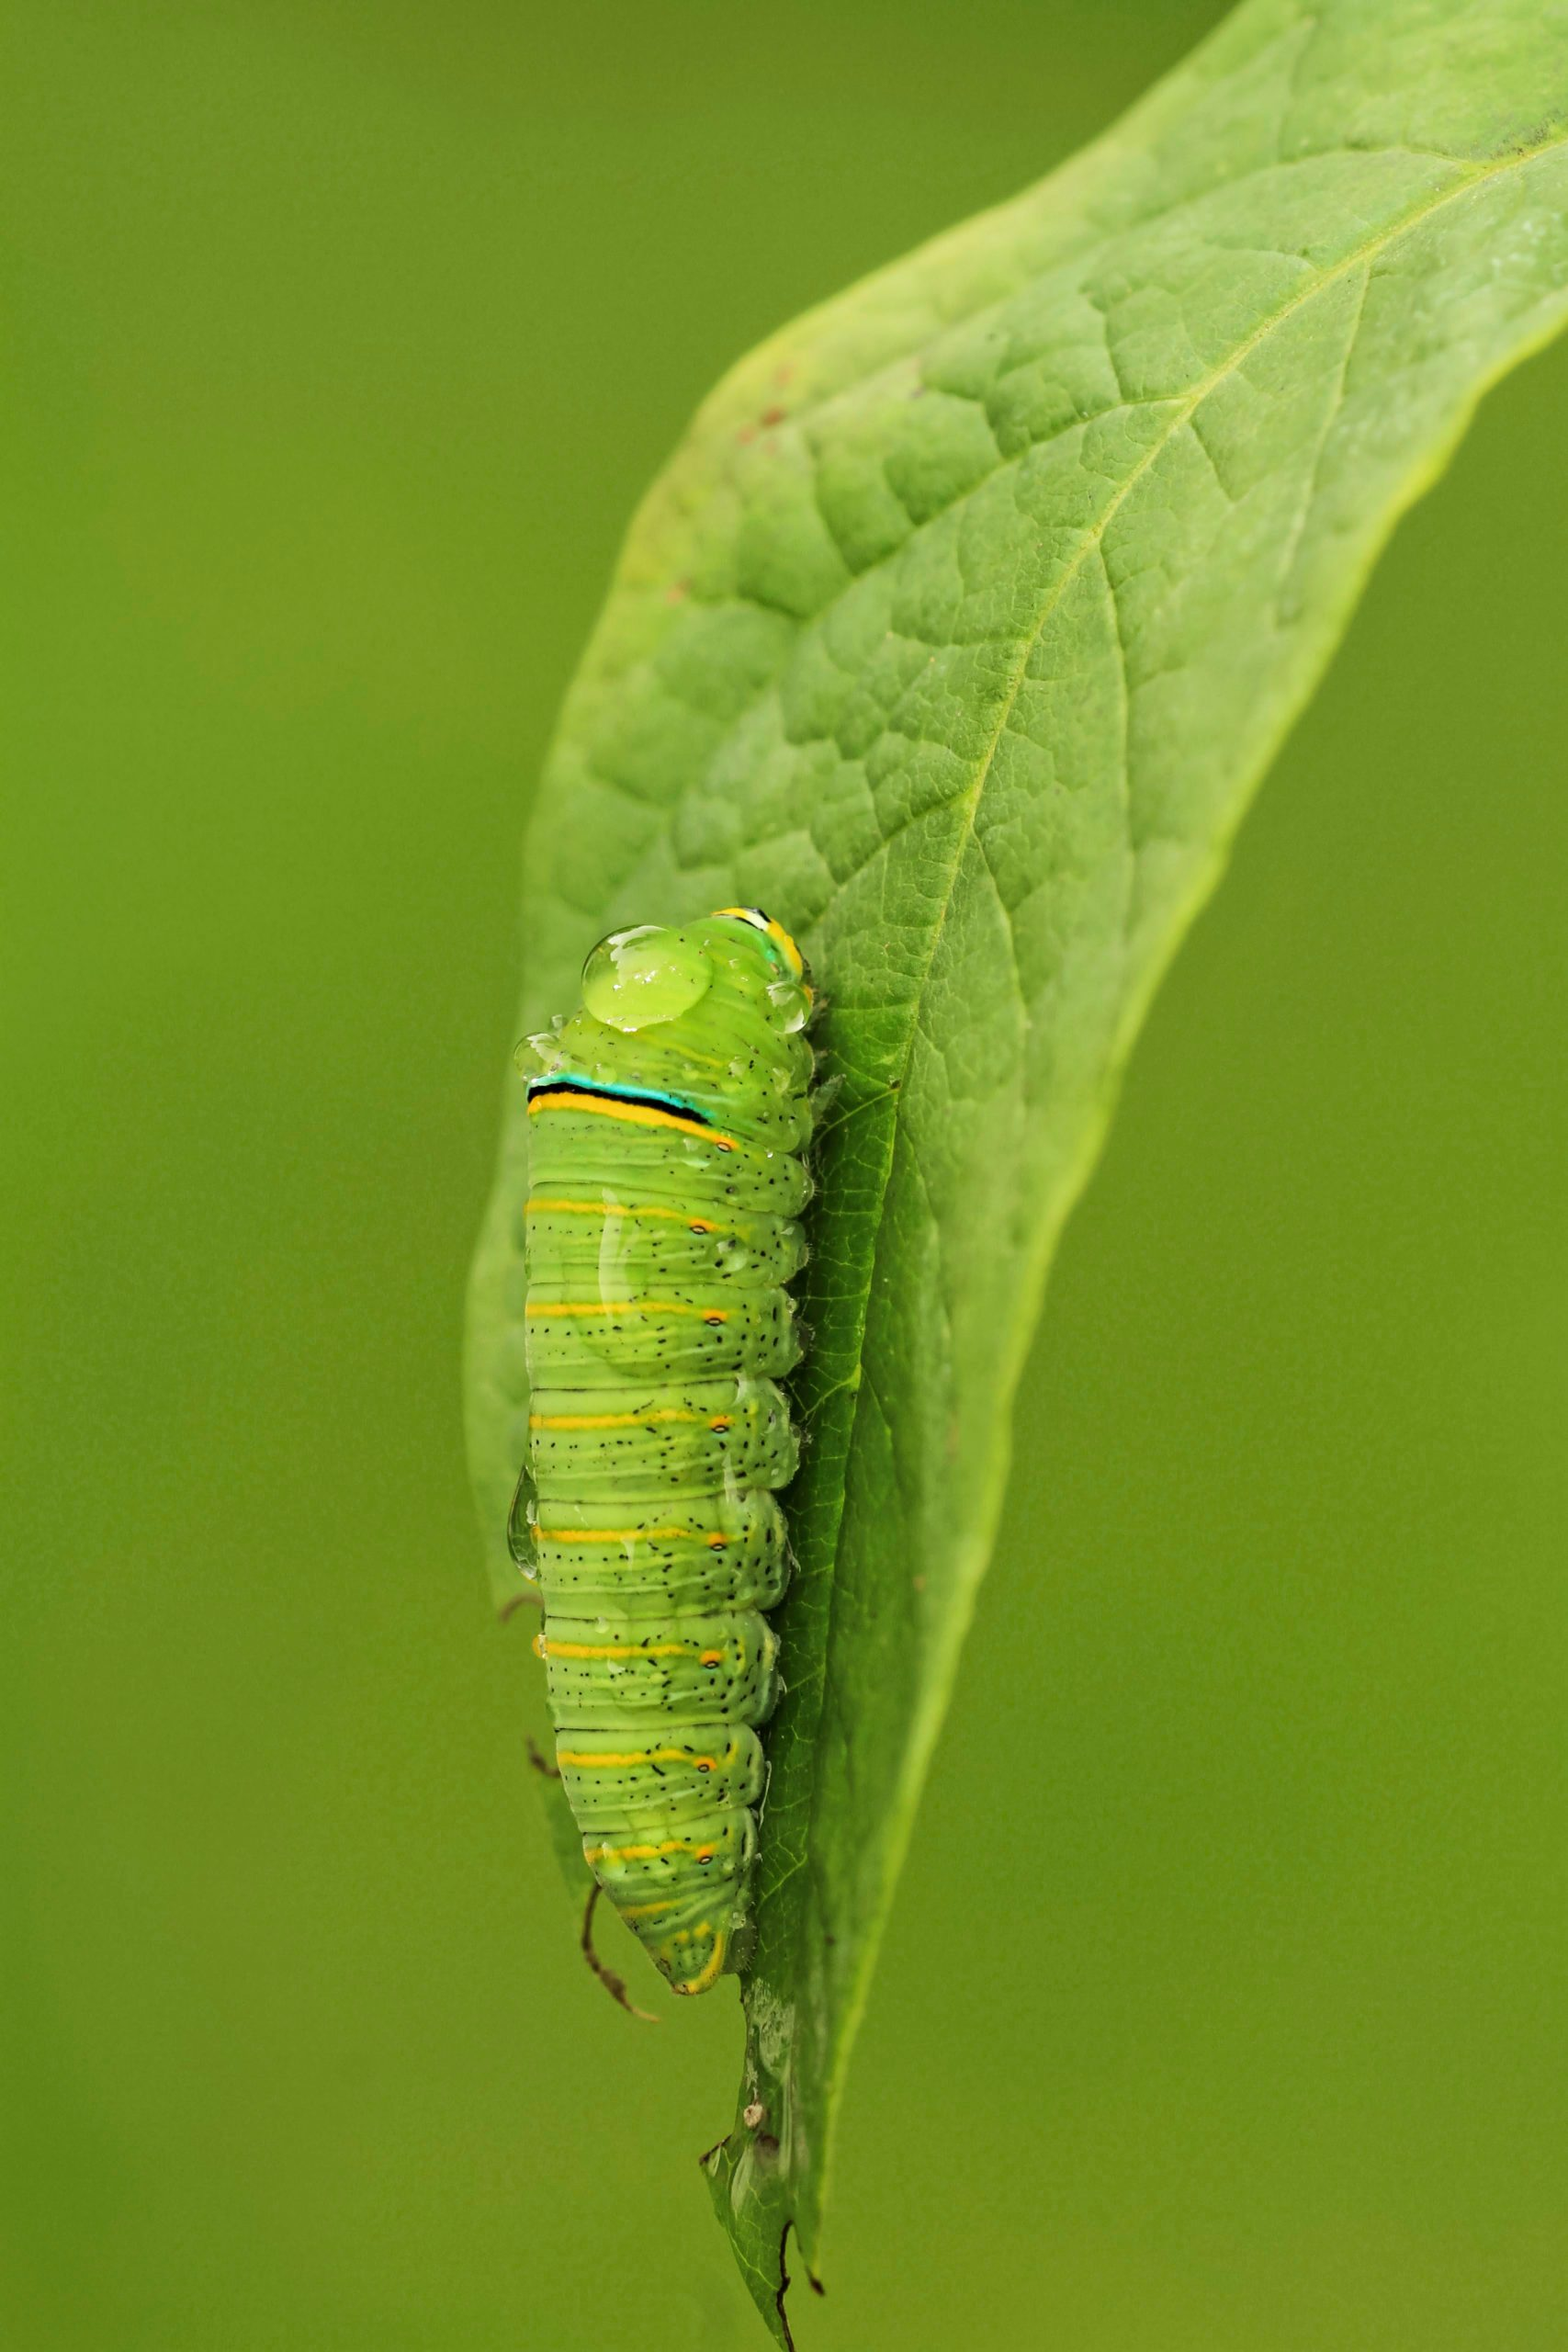 A zebra swallowtail caterpillar clinging to a leaf.